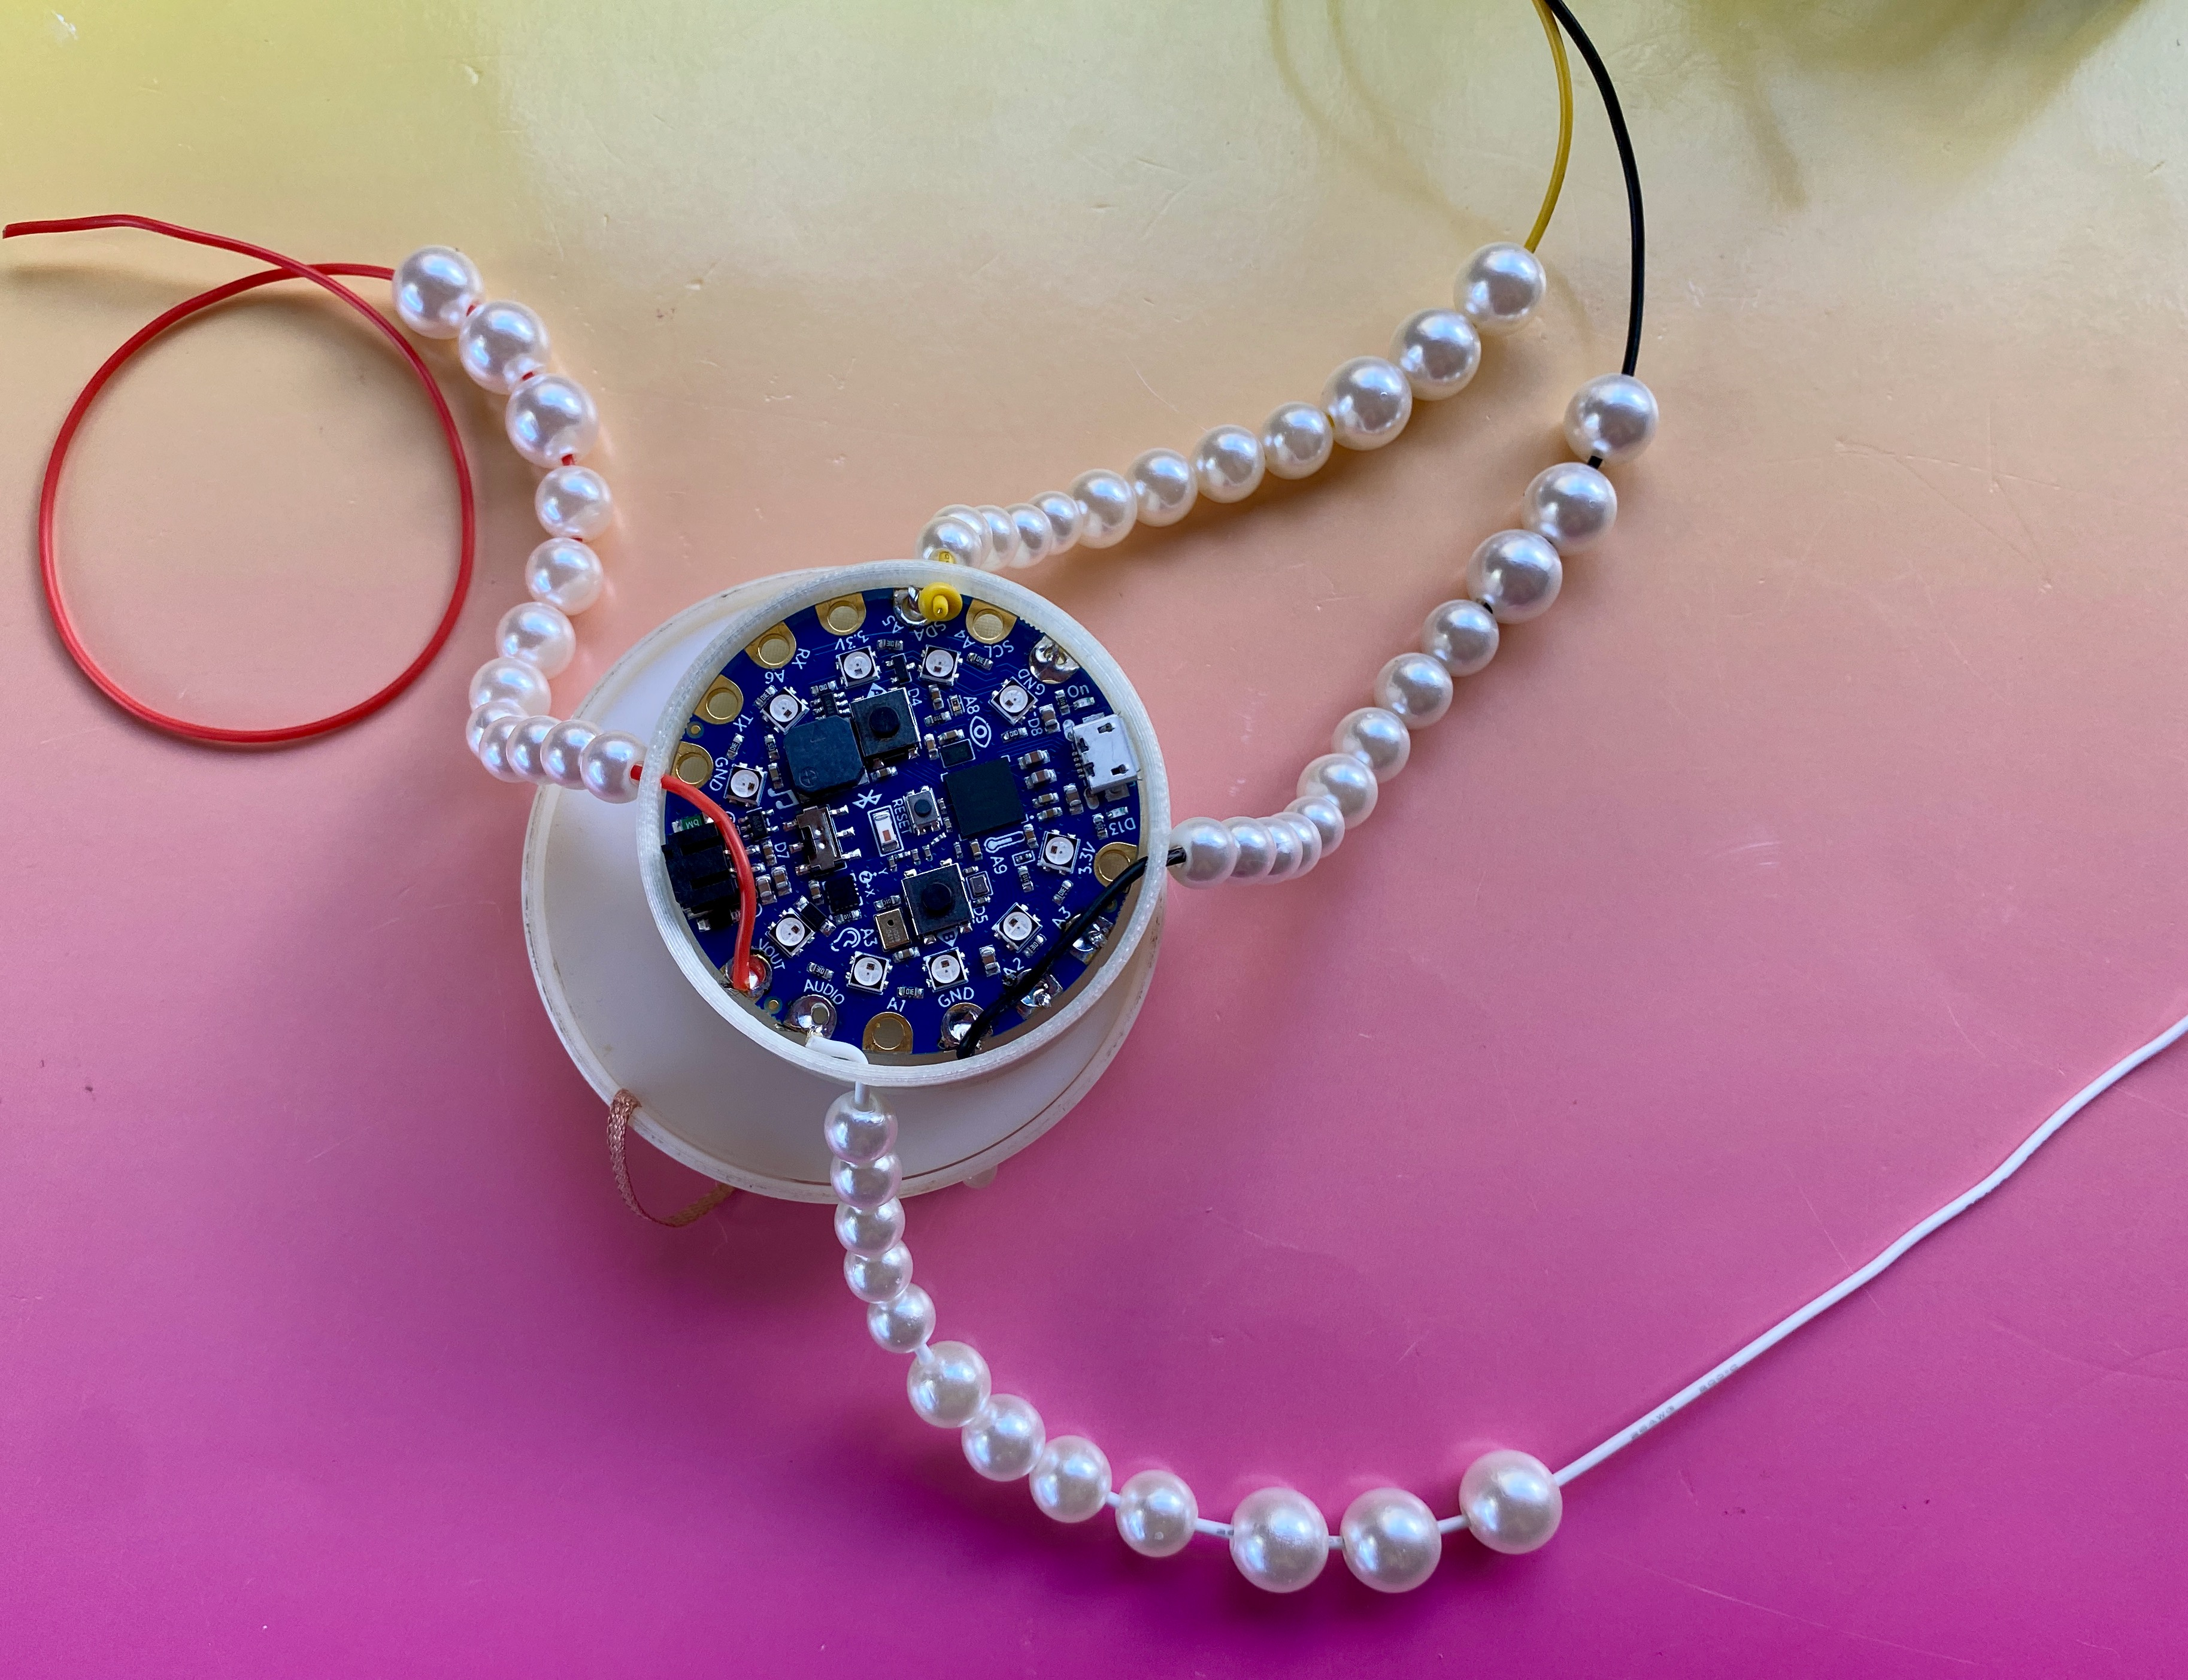 led_pixels_assembly2_pearls.jpeg